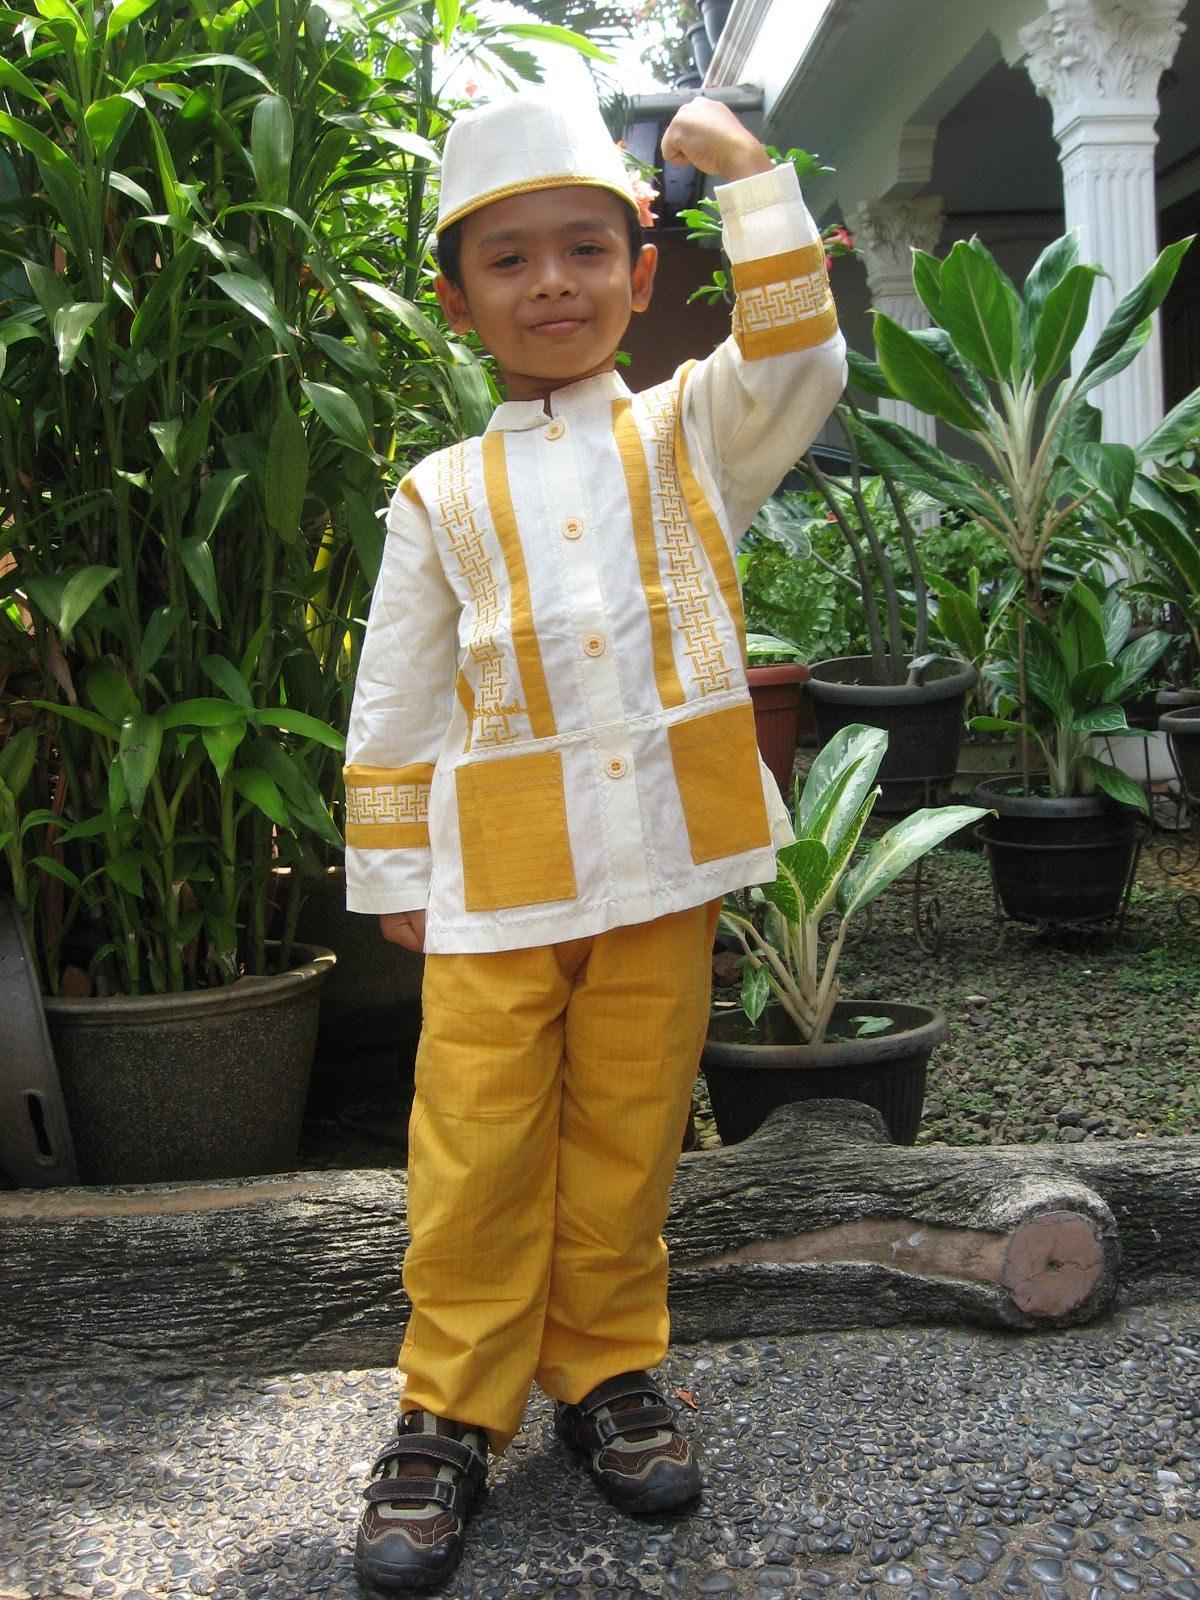 Ide Baju Lebaran Untuk Laki Laki Budm Inilah Model Baju Koko Anak Terbaru Lebaran 2016